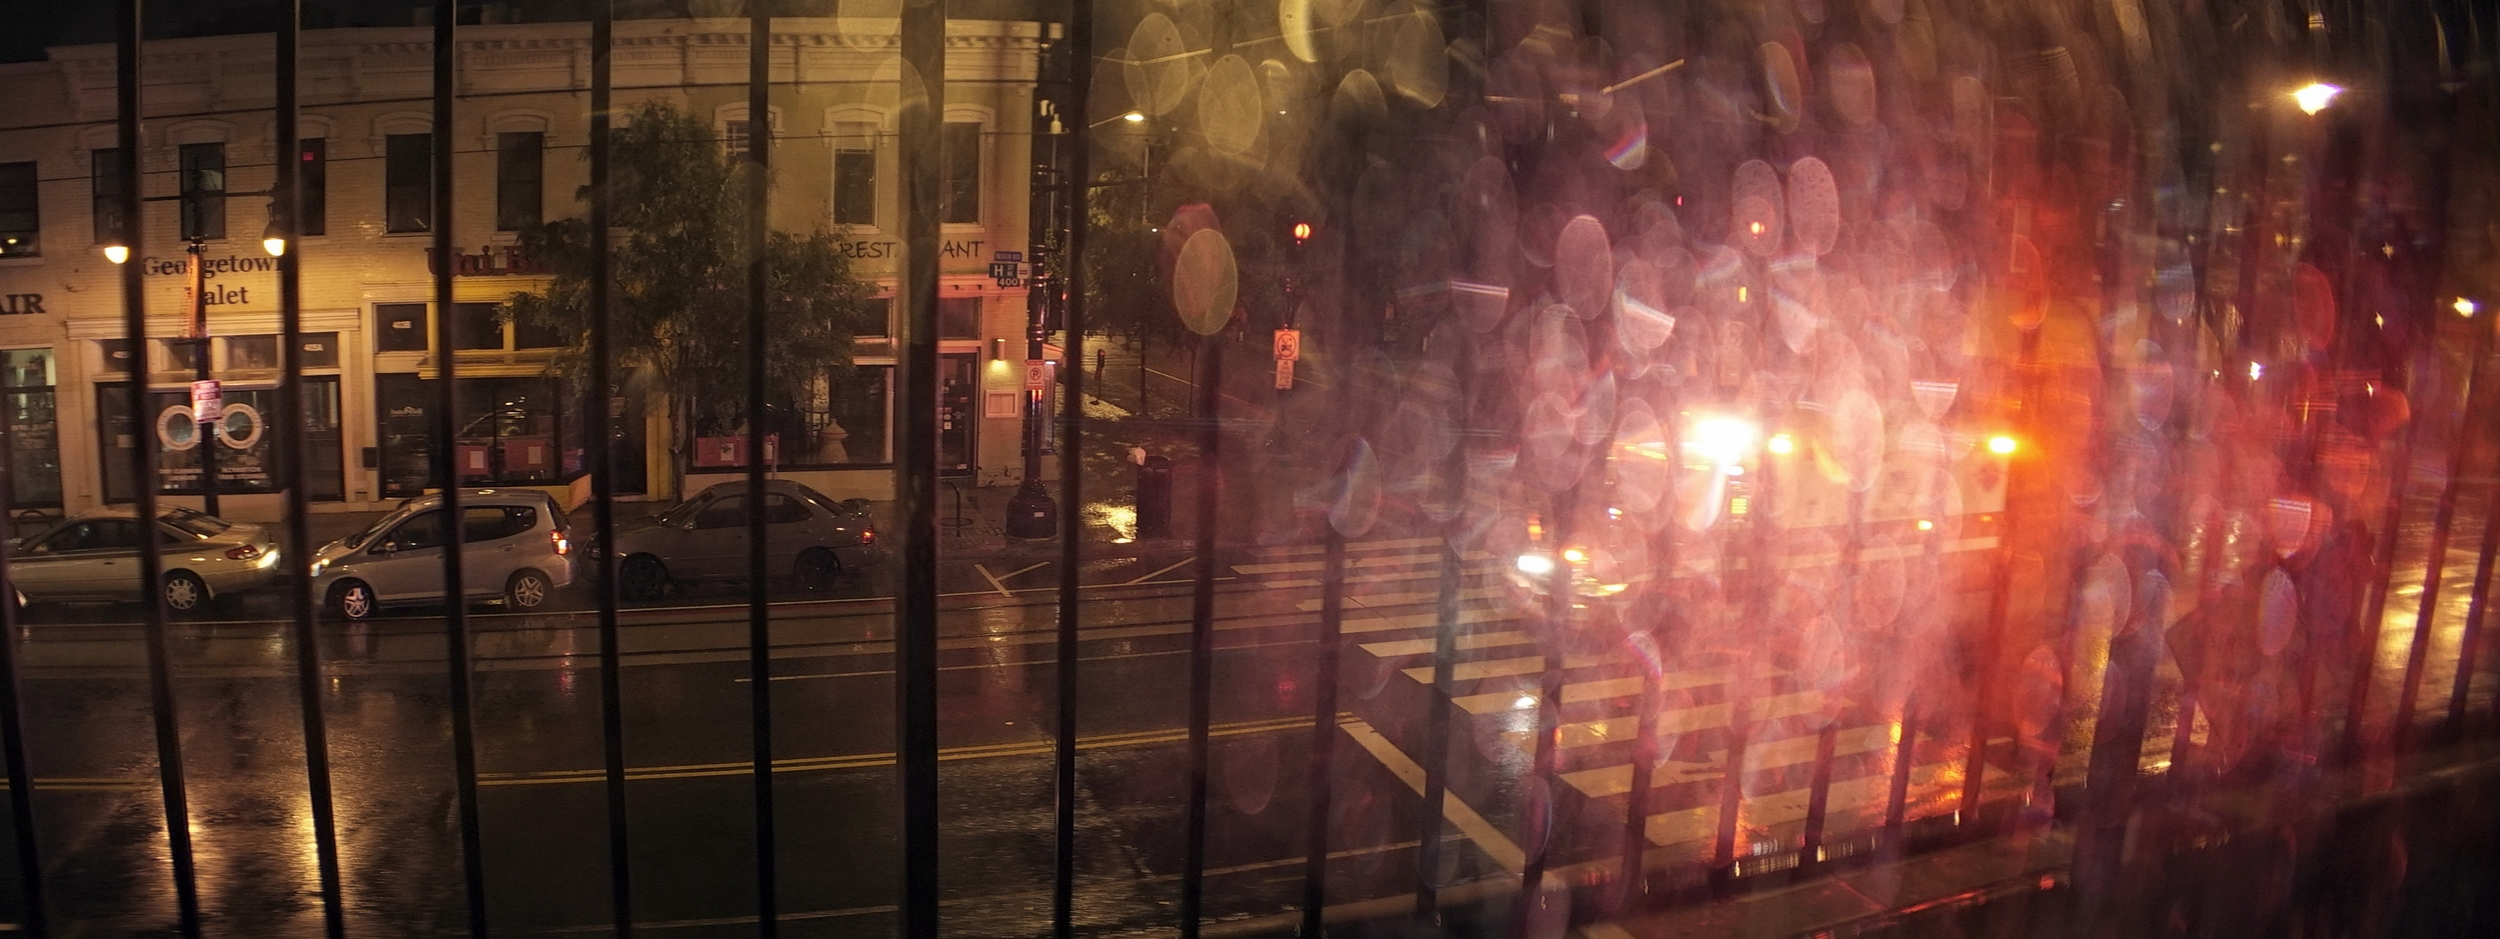 Elite 24.5mm anamorphic | Washington D.C. - An ambulance rushes past a rain-soaked window in Washington D.C. T2.1. Photo by Keith Nickoson.